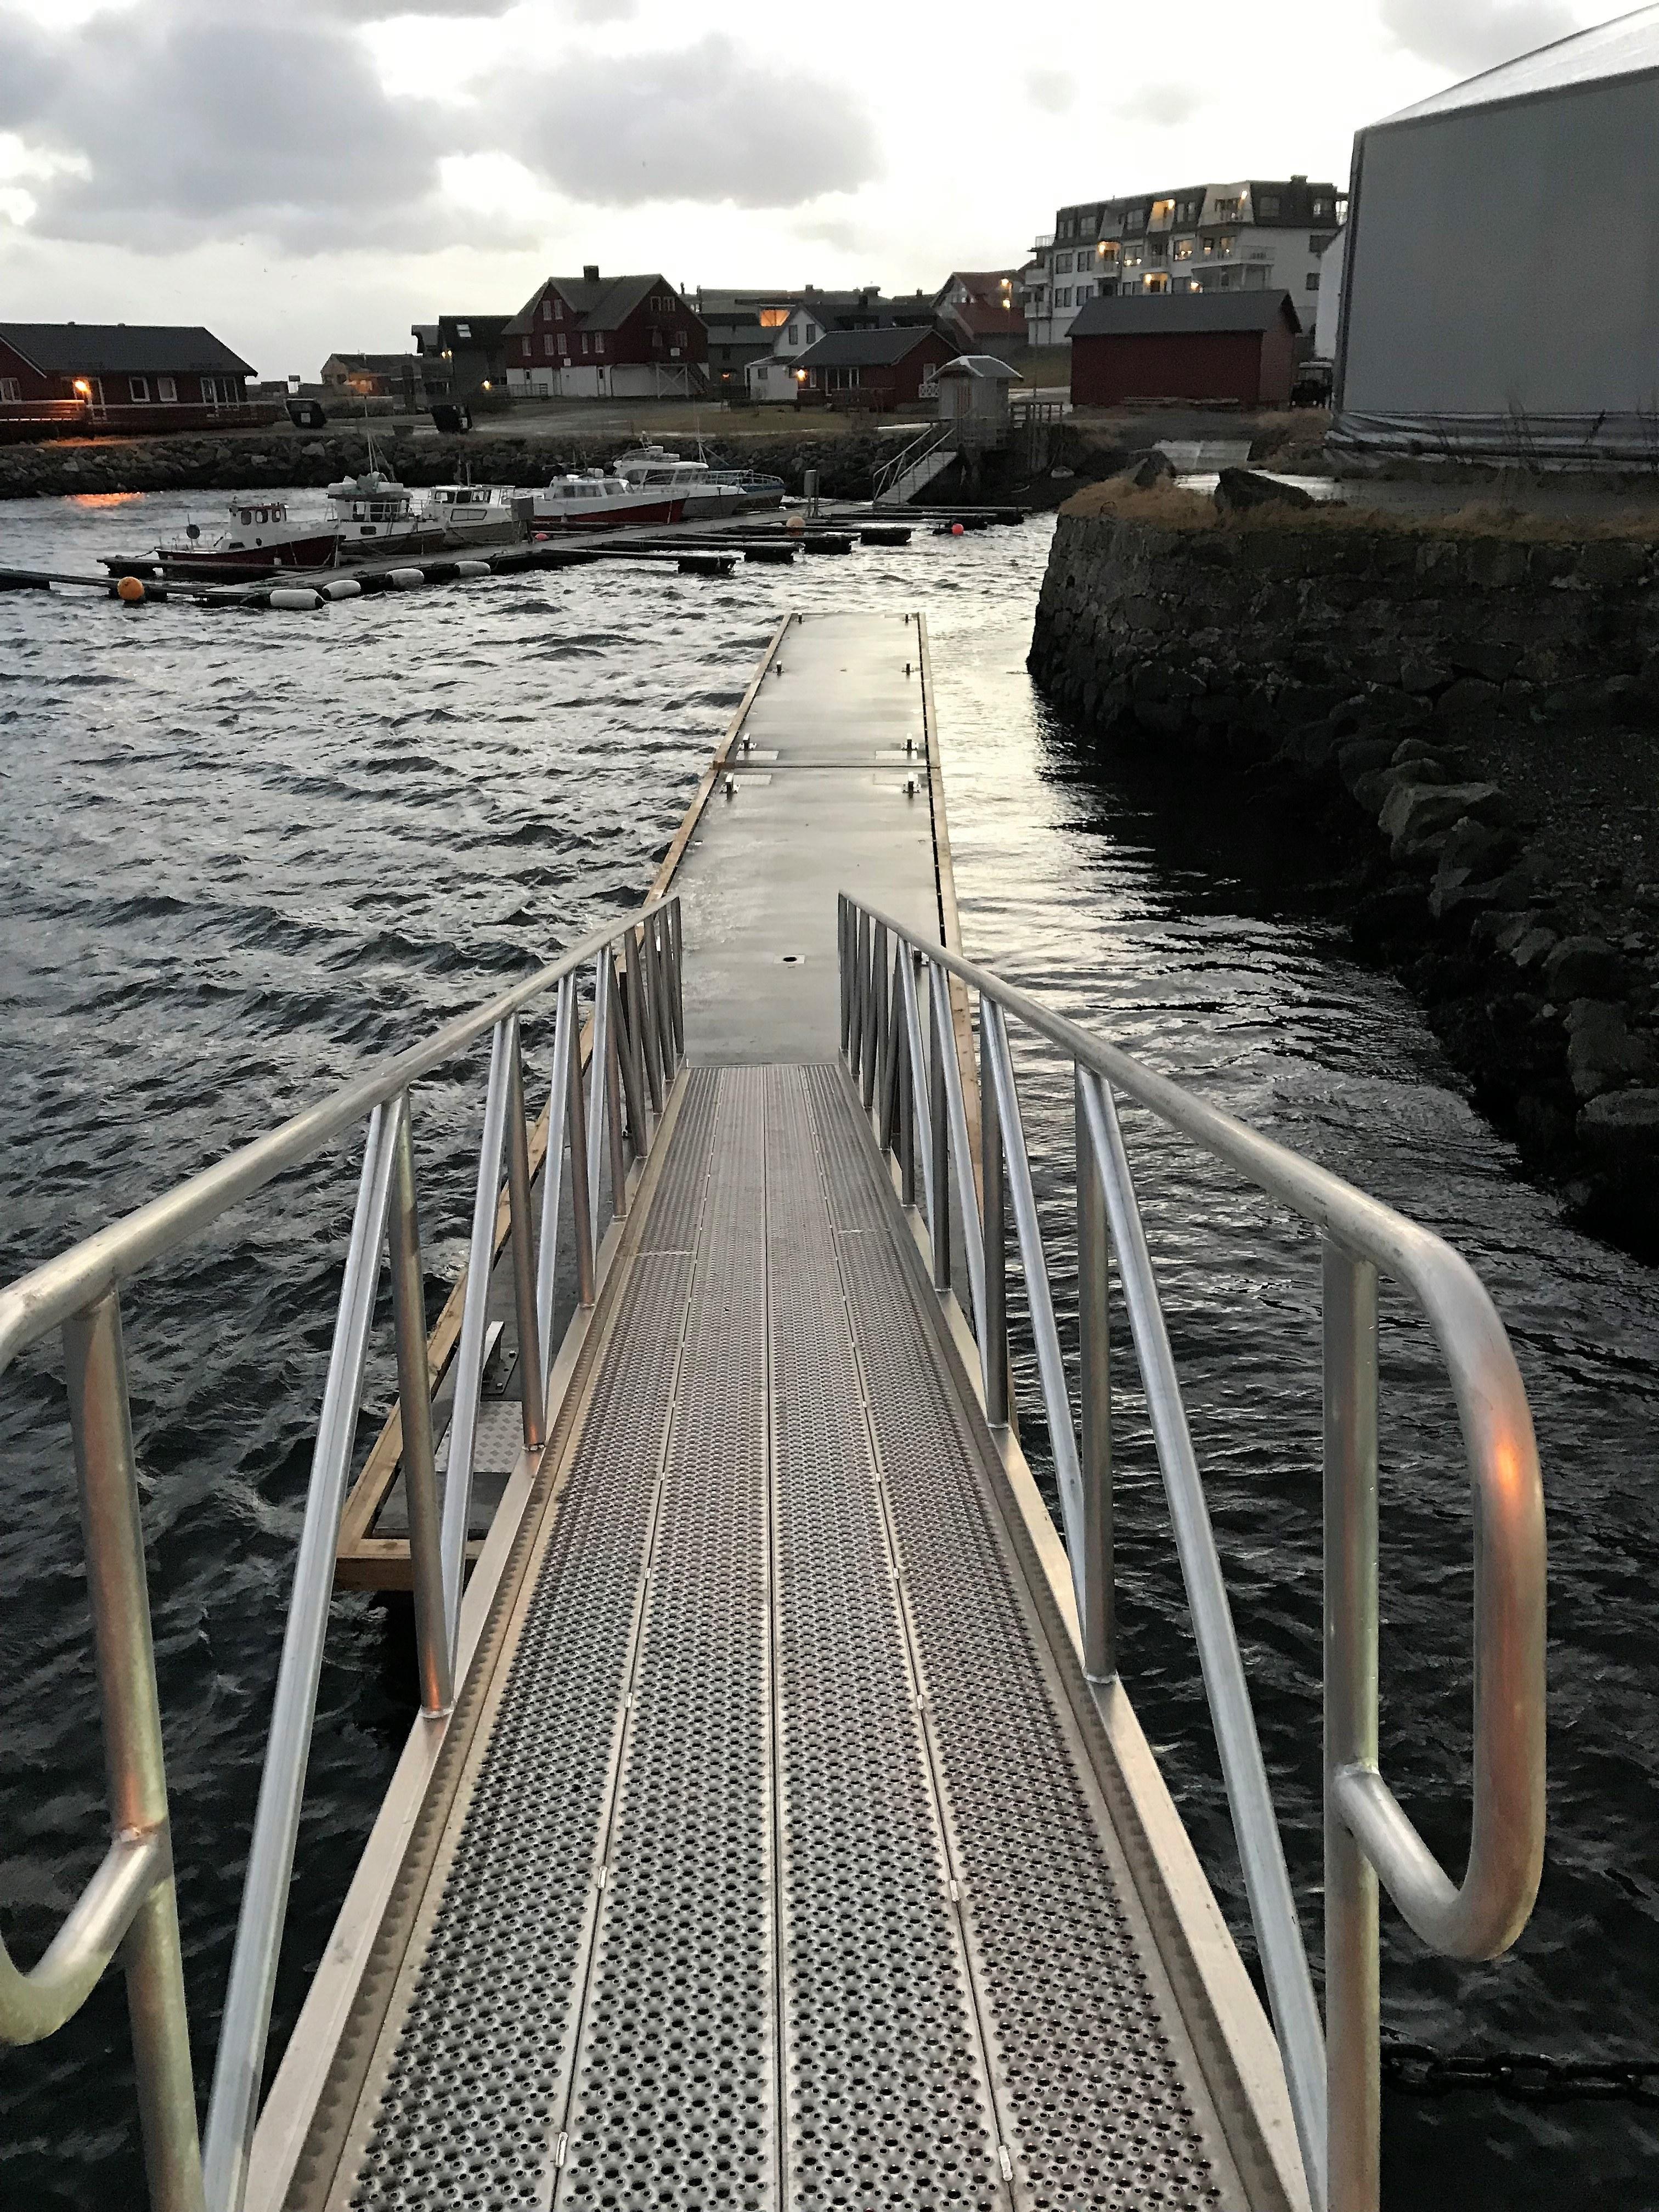 https://marinasolutions.no/uploads/Jangaard-Export-Andenes-Marina-Solutions-Brygge-2.jpg